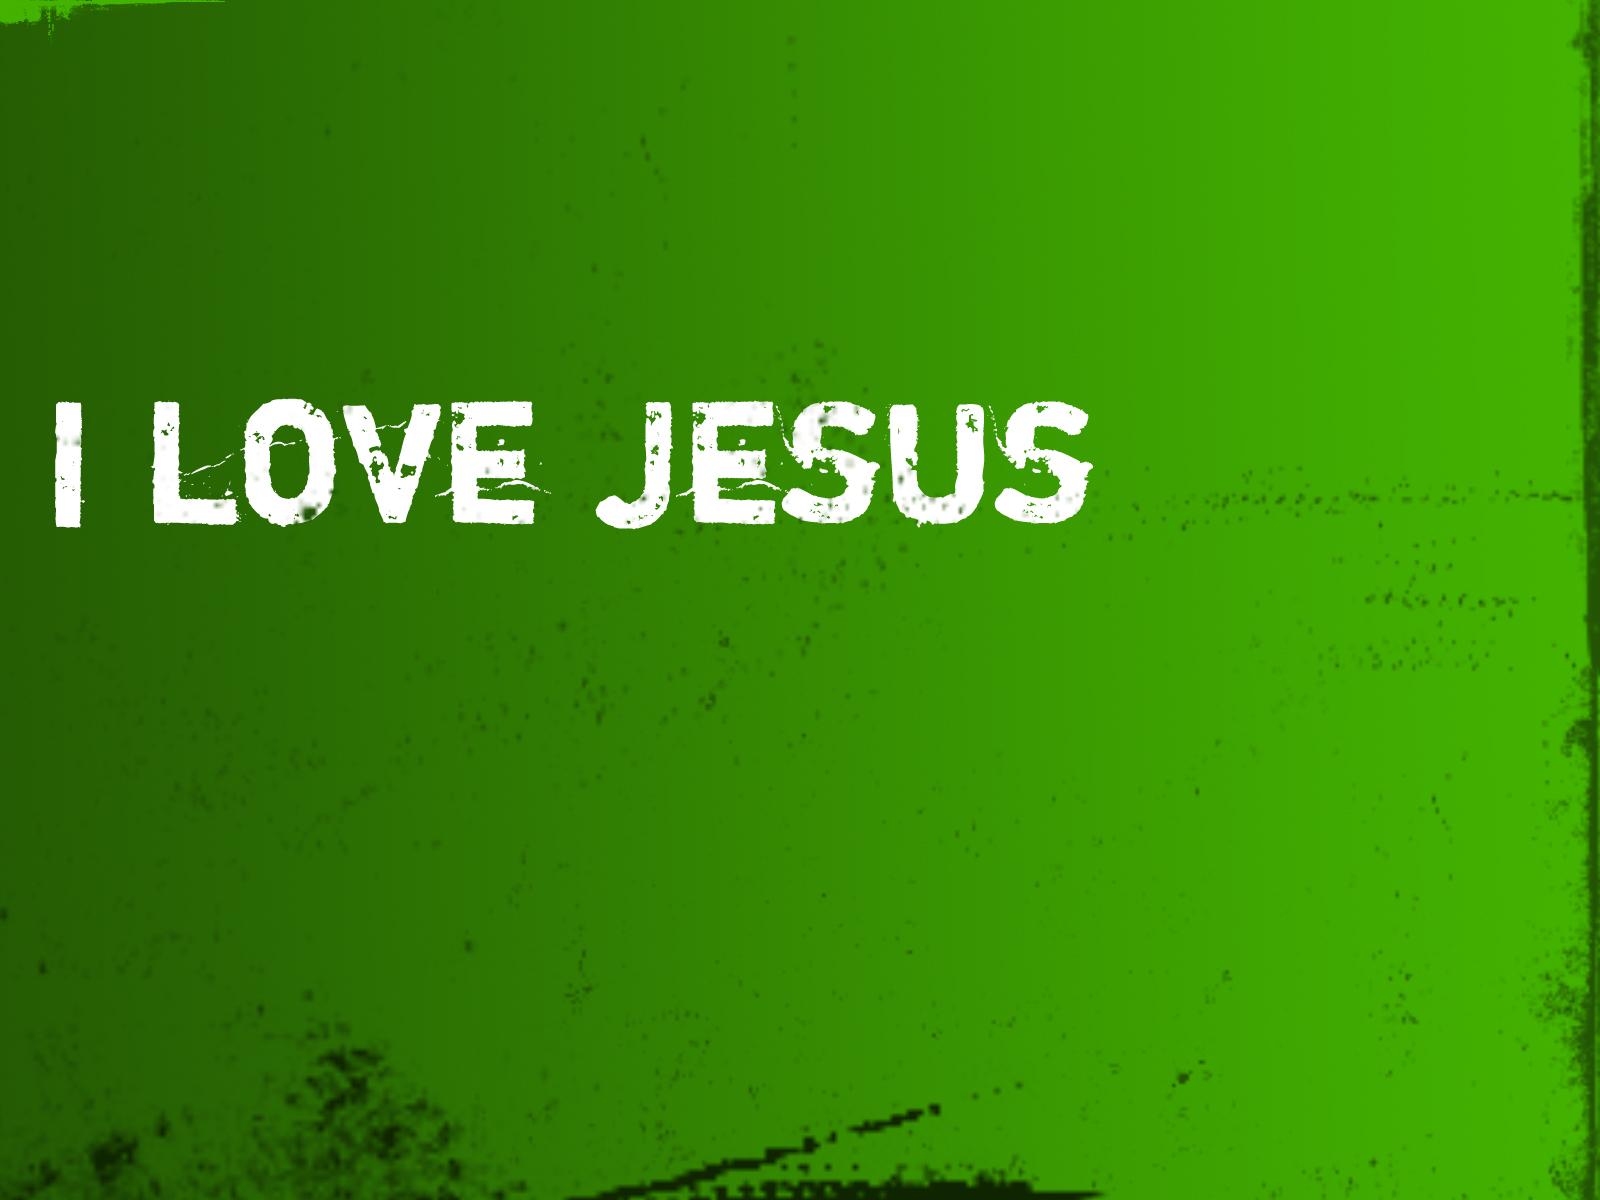 http://1.bp.blogspot.com/-HSxPdJMi2hc/Taakl2hhBuI/AAAAAAAACKI/YkiyvzJaSWI/s1600/love_jesus_wallpaper.jpg